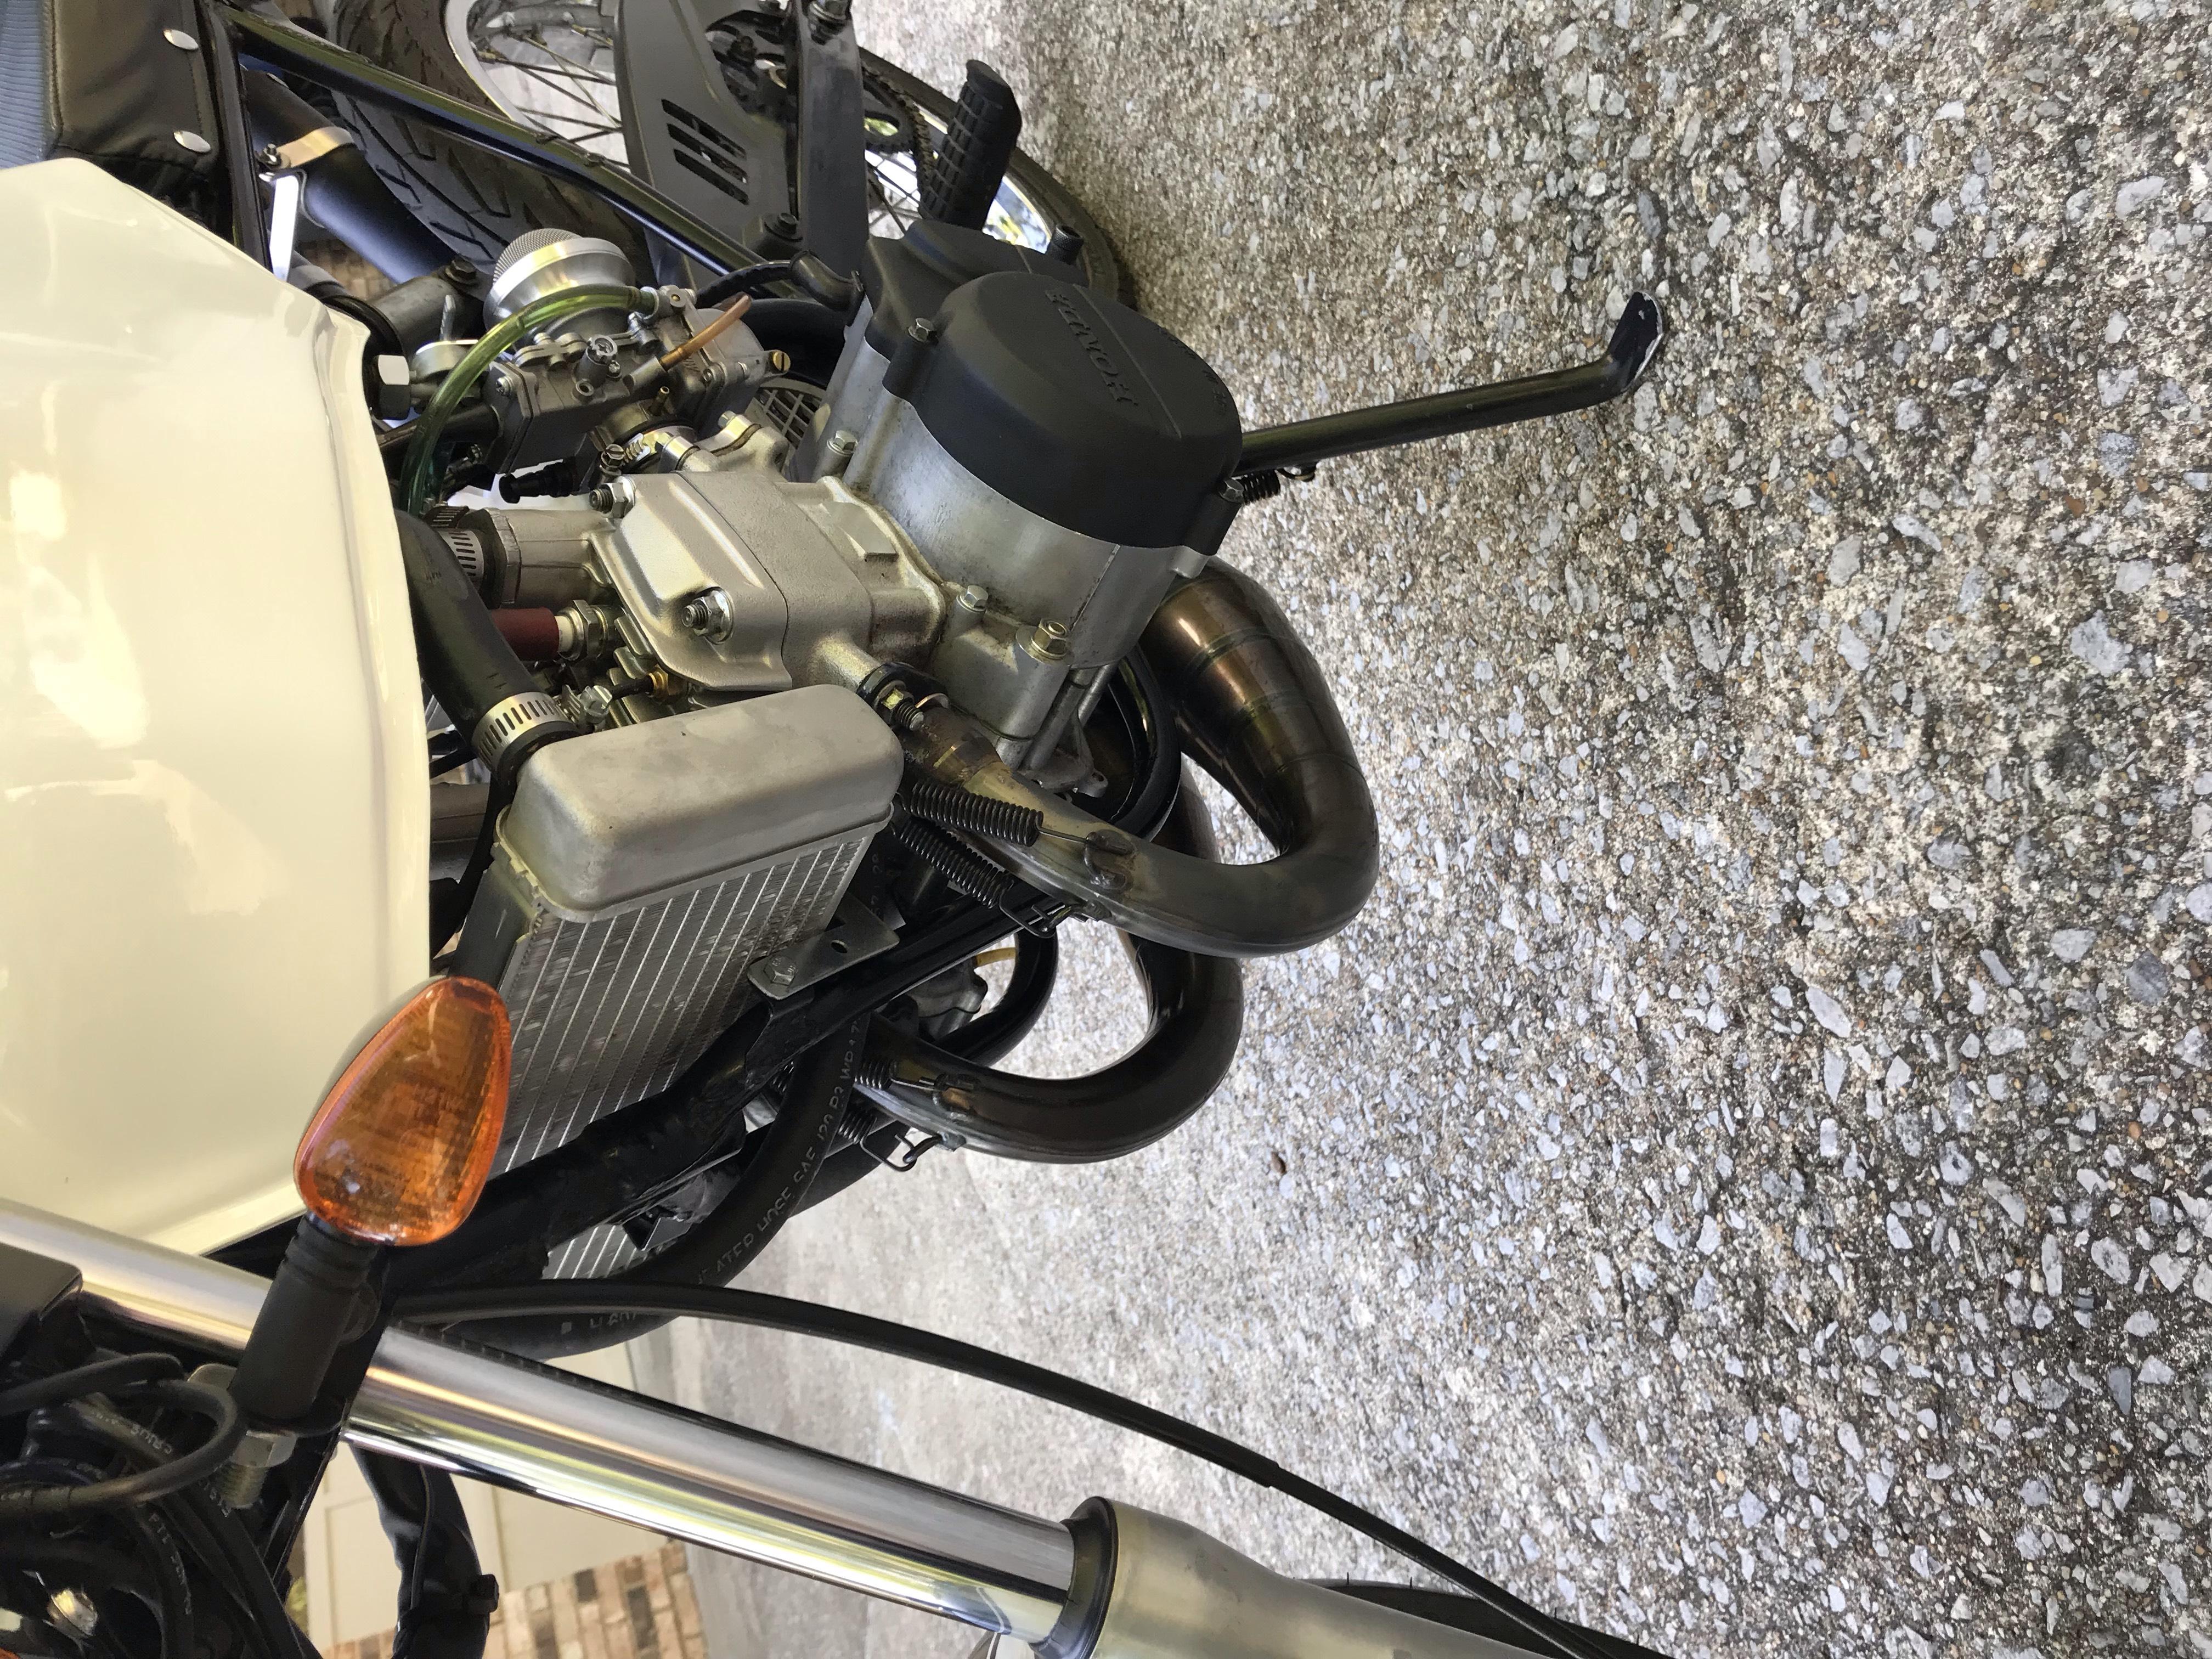 Grom Alternative? Honda NS50F-img_0571.jpg